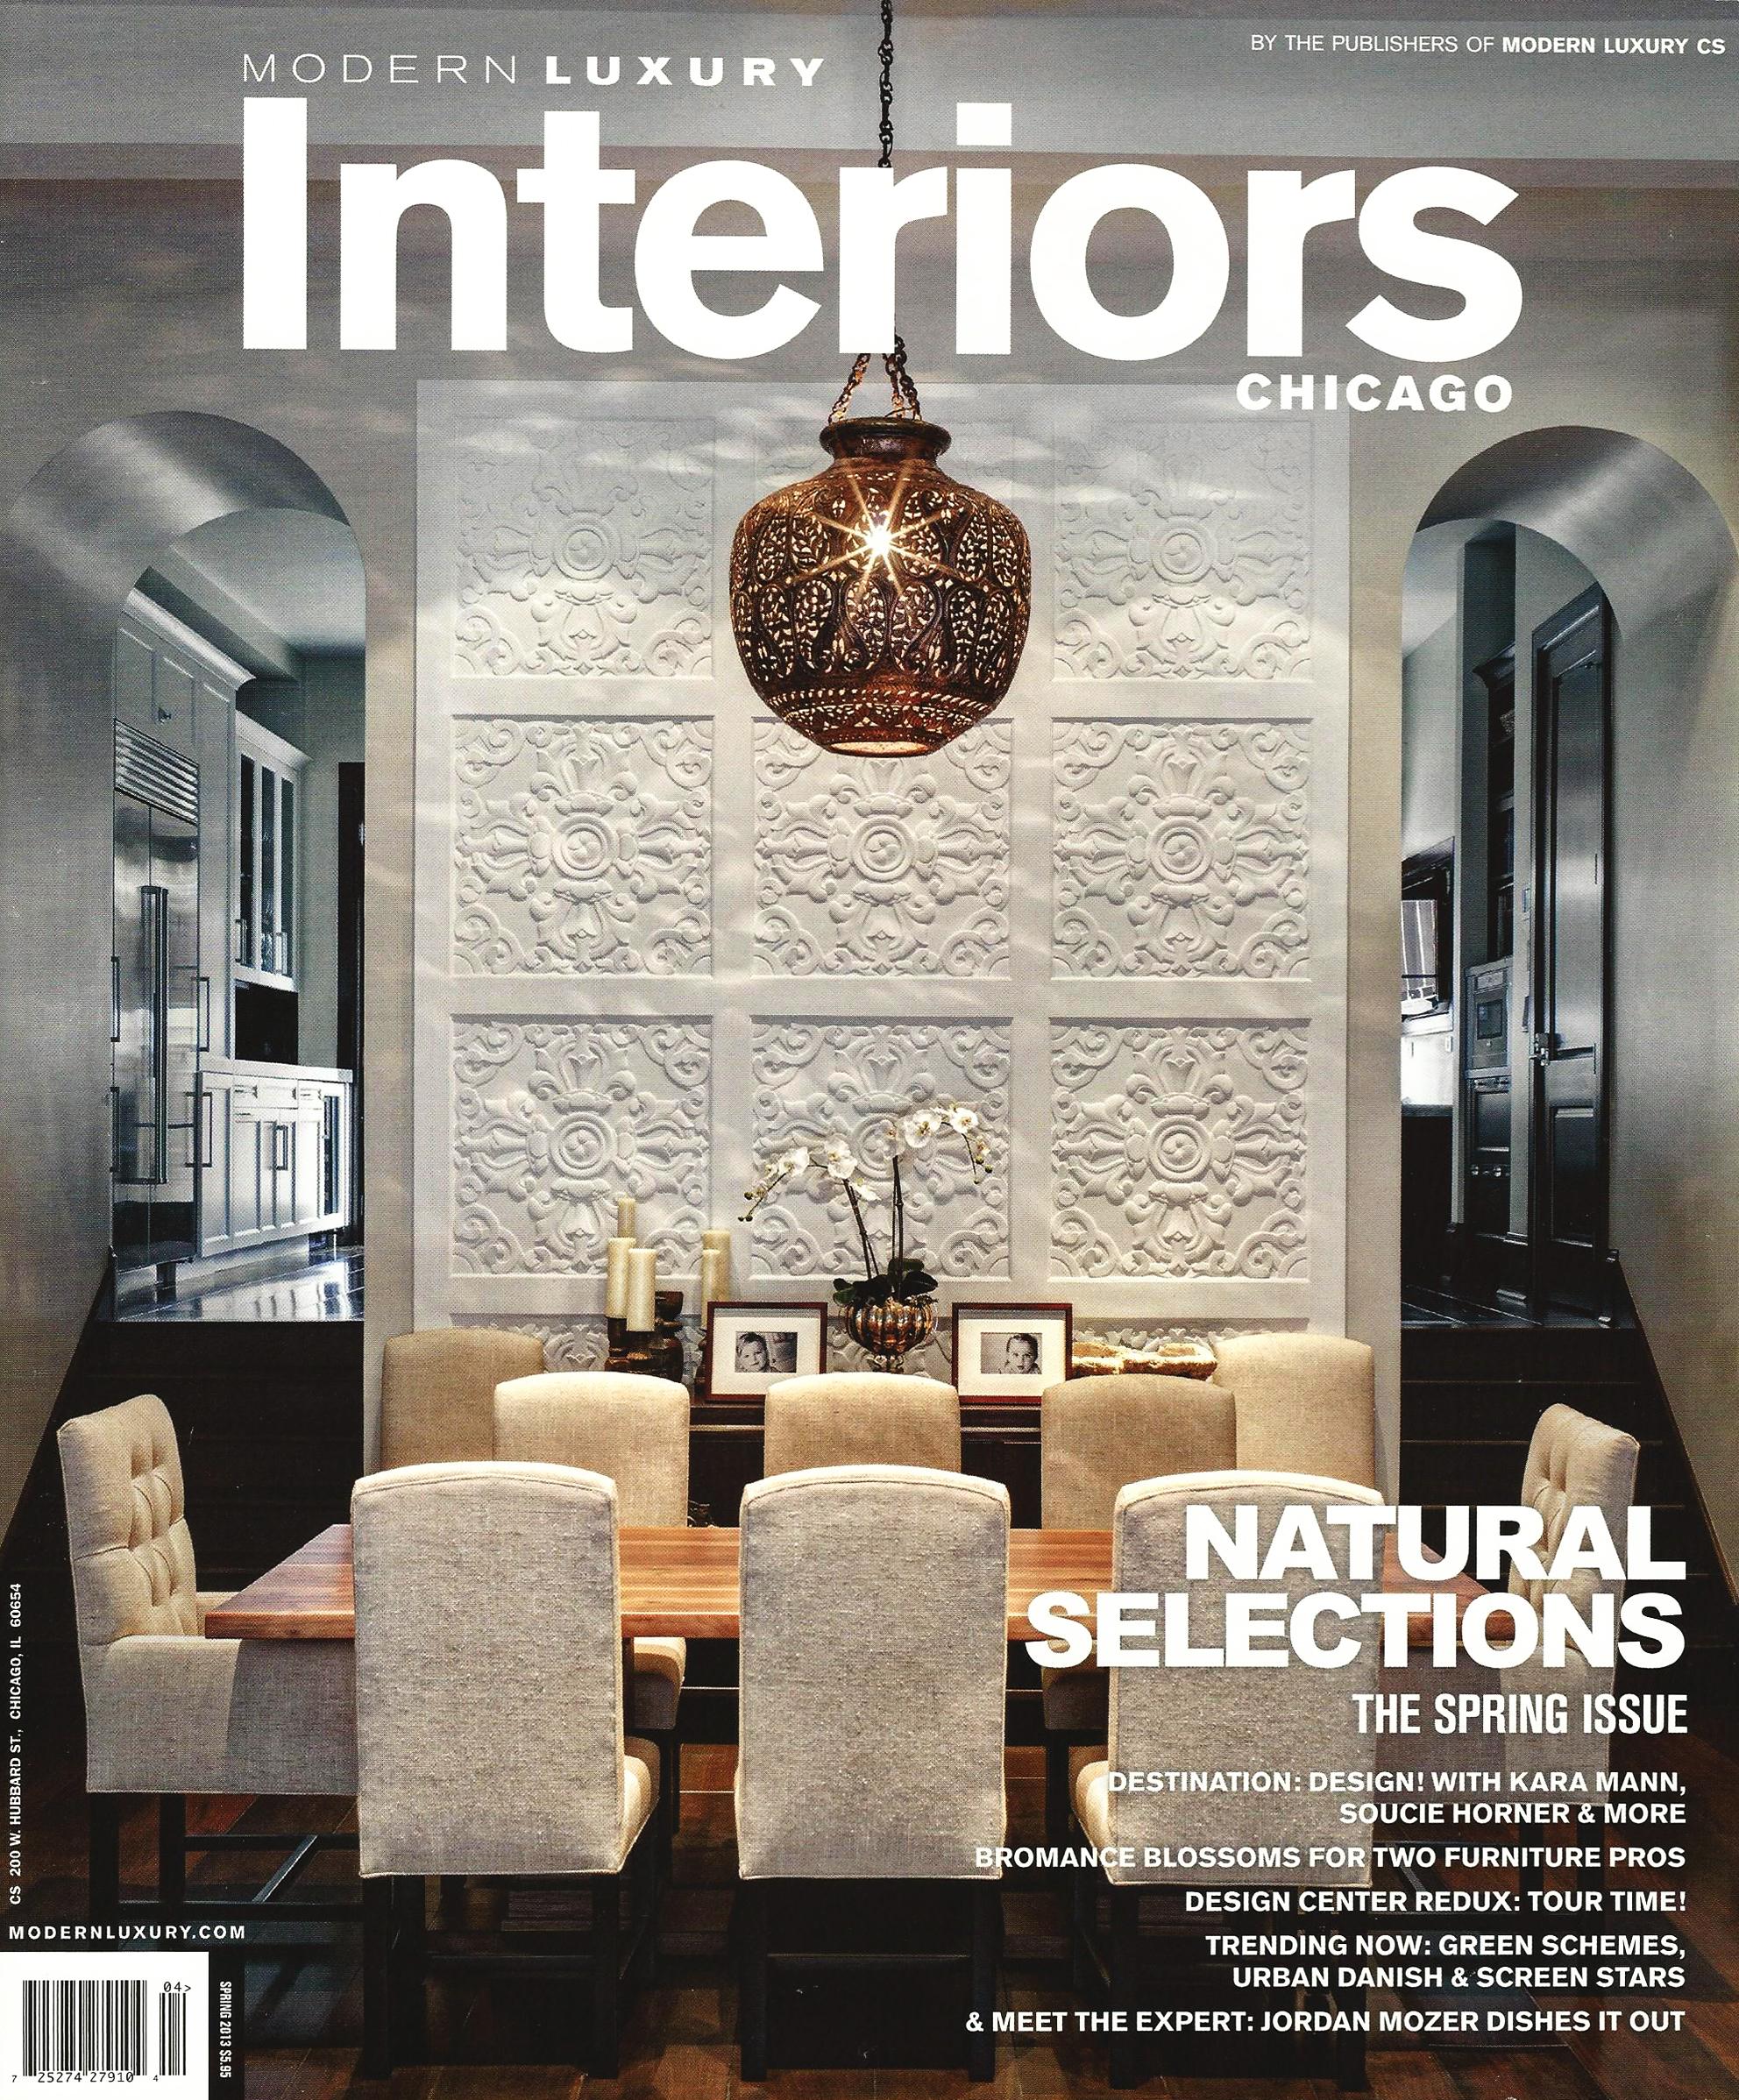 Modern Luxury Interiors Chicago - Spring - pg 58 60 - 2013